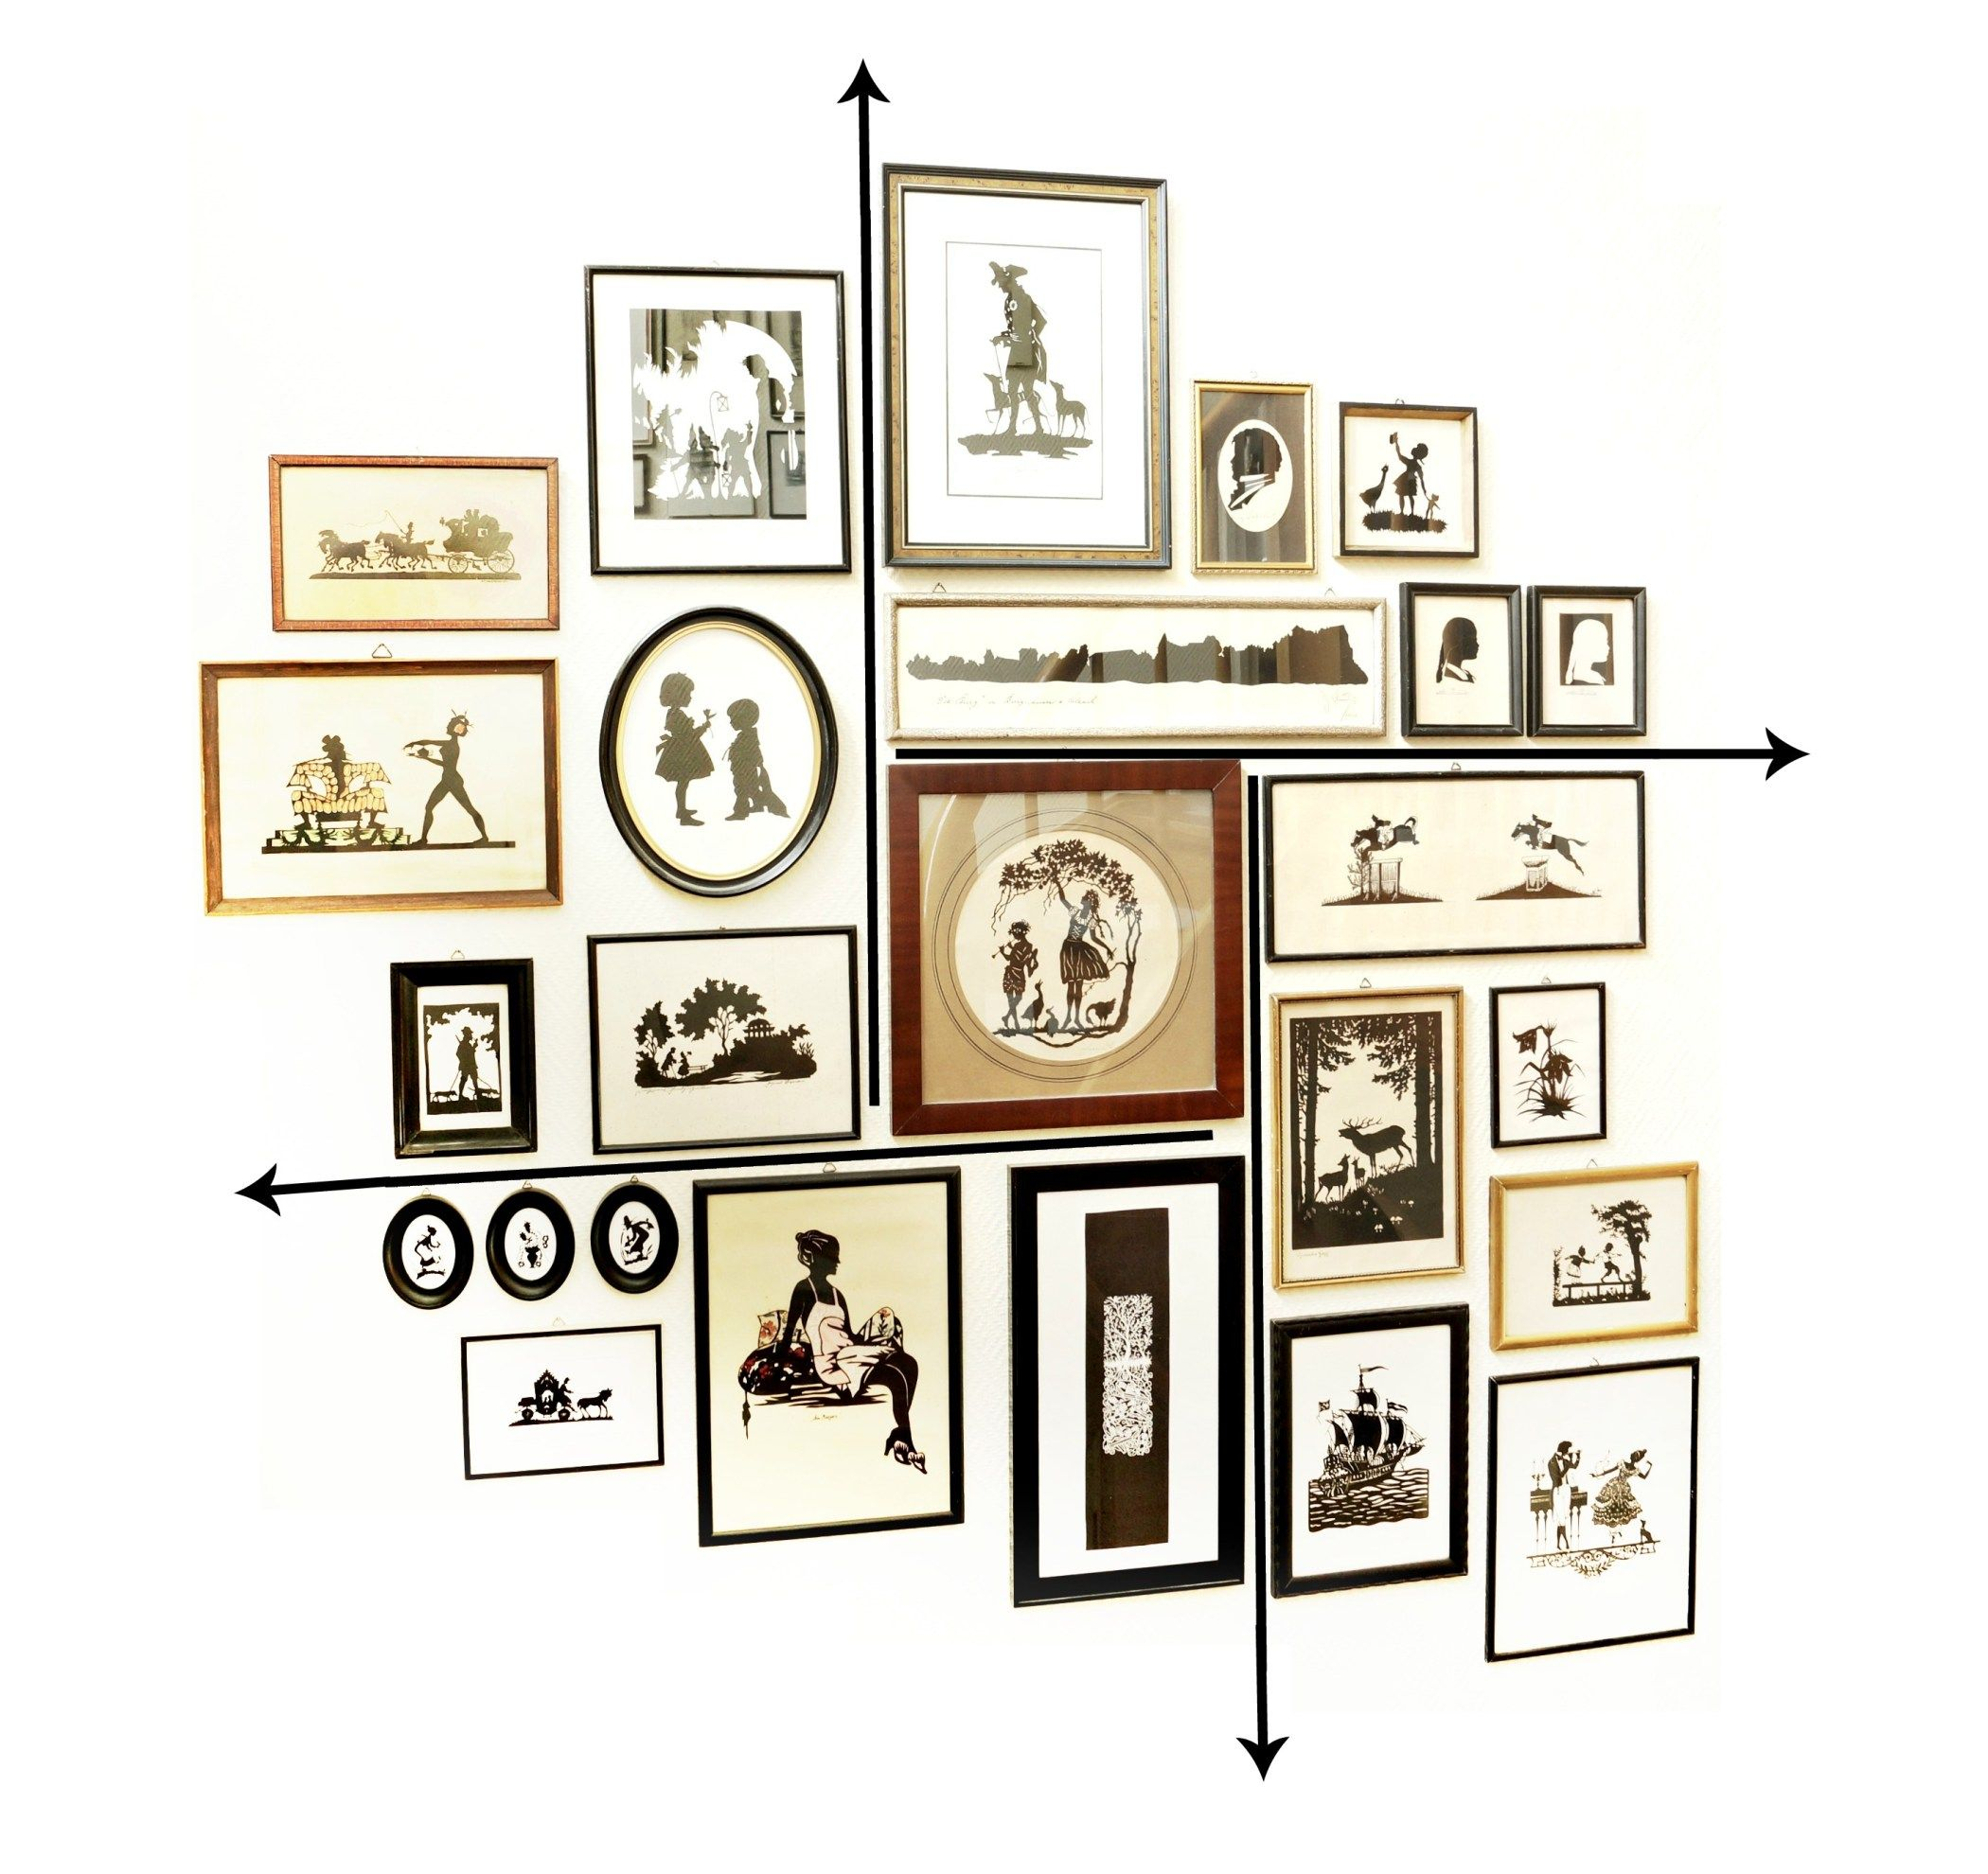 5 Tips On Hanging A Growing Gallery Wall Galeriewand Collage Bilderrahmen Fotowand Gestalten